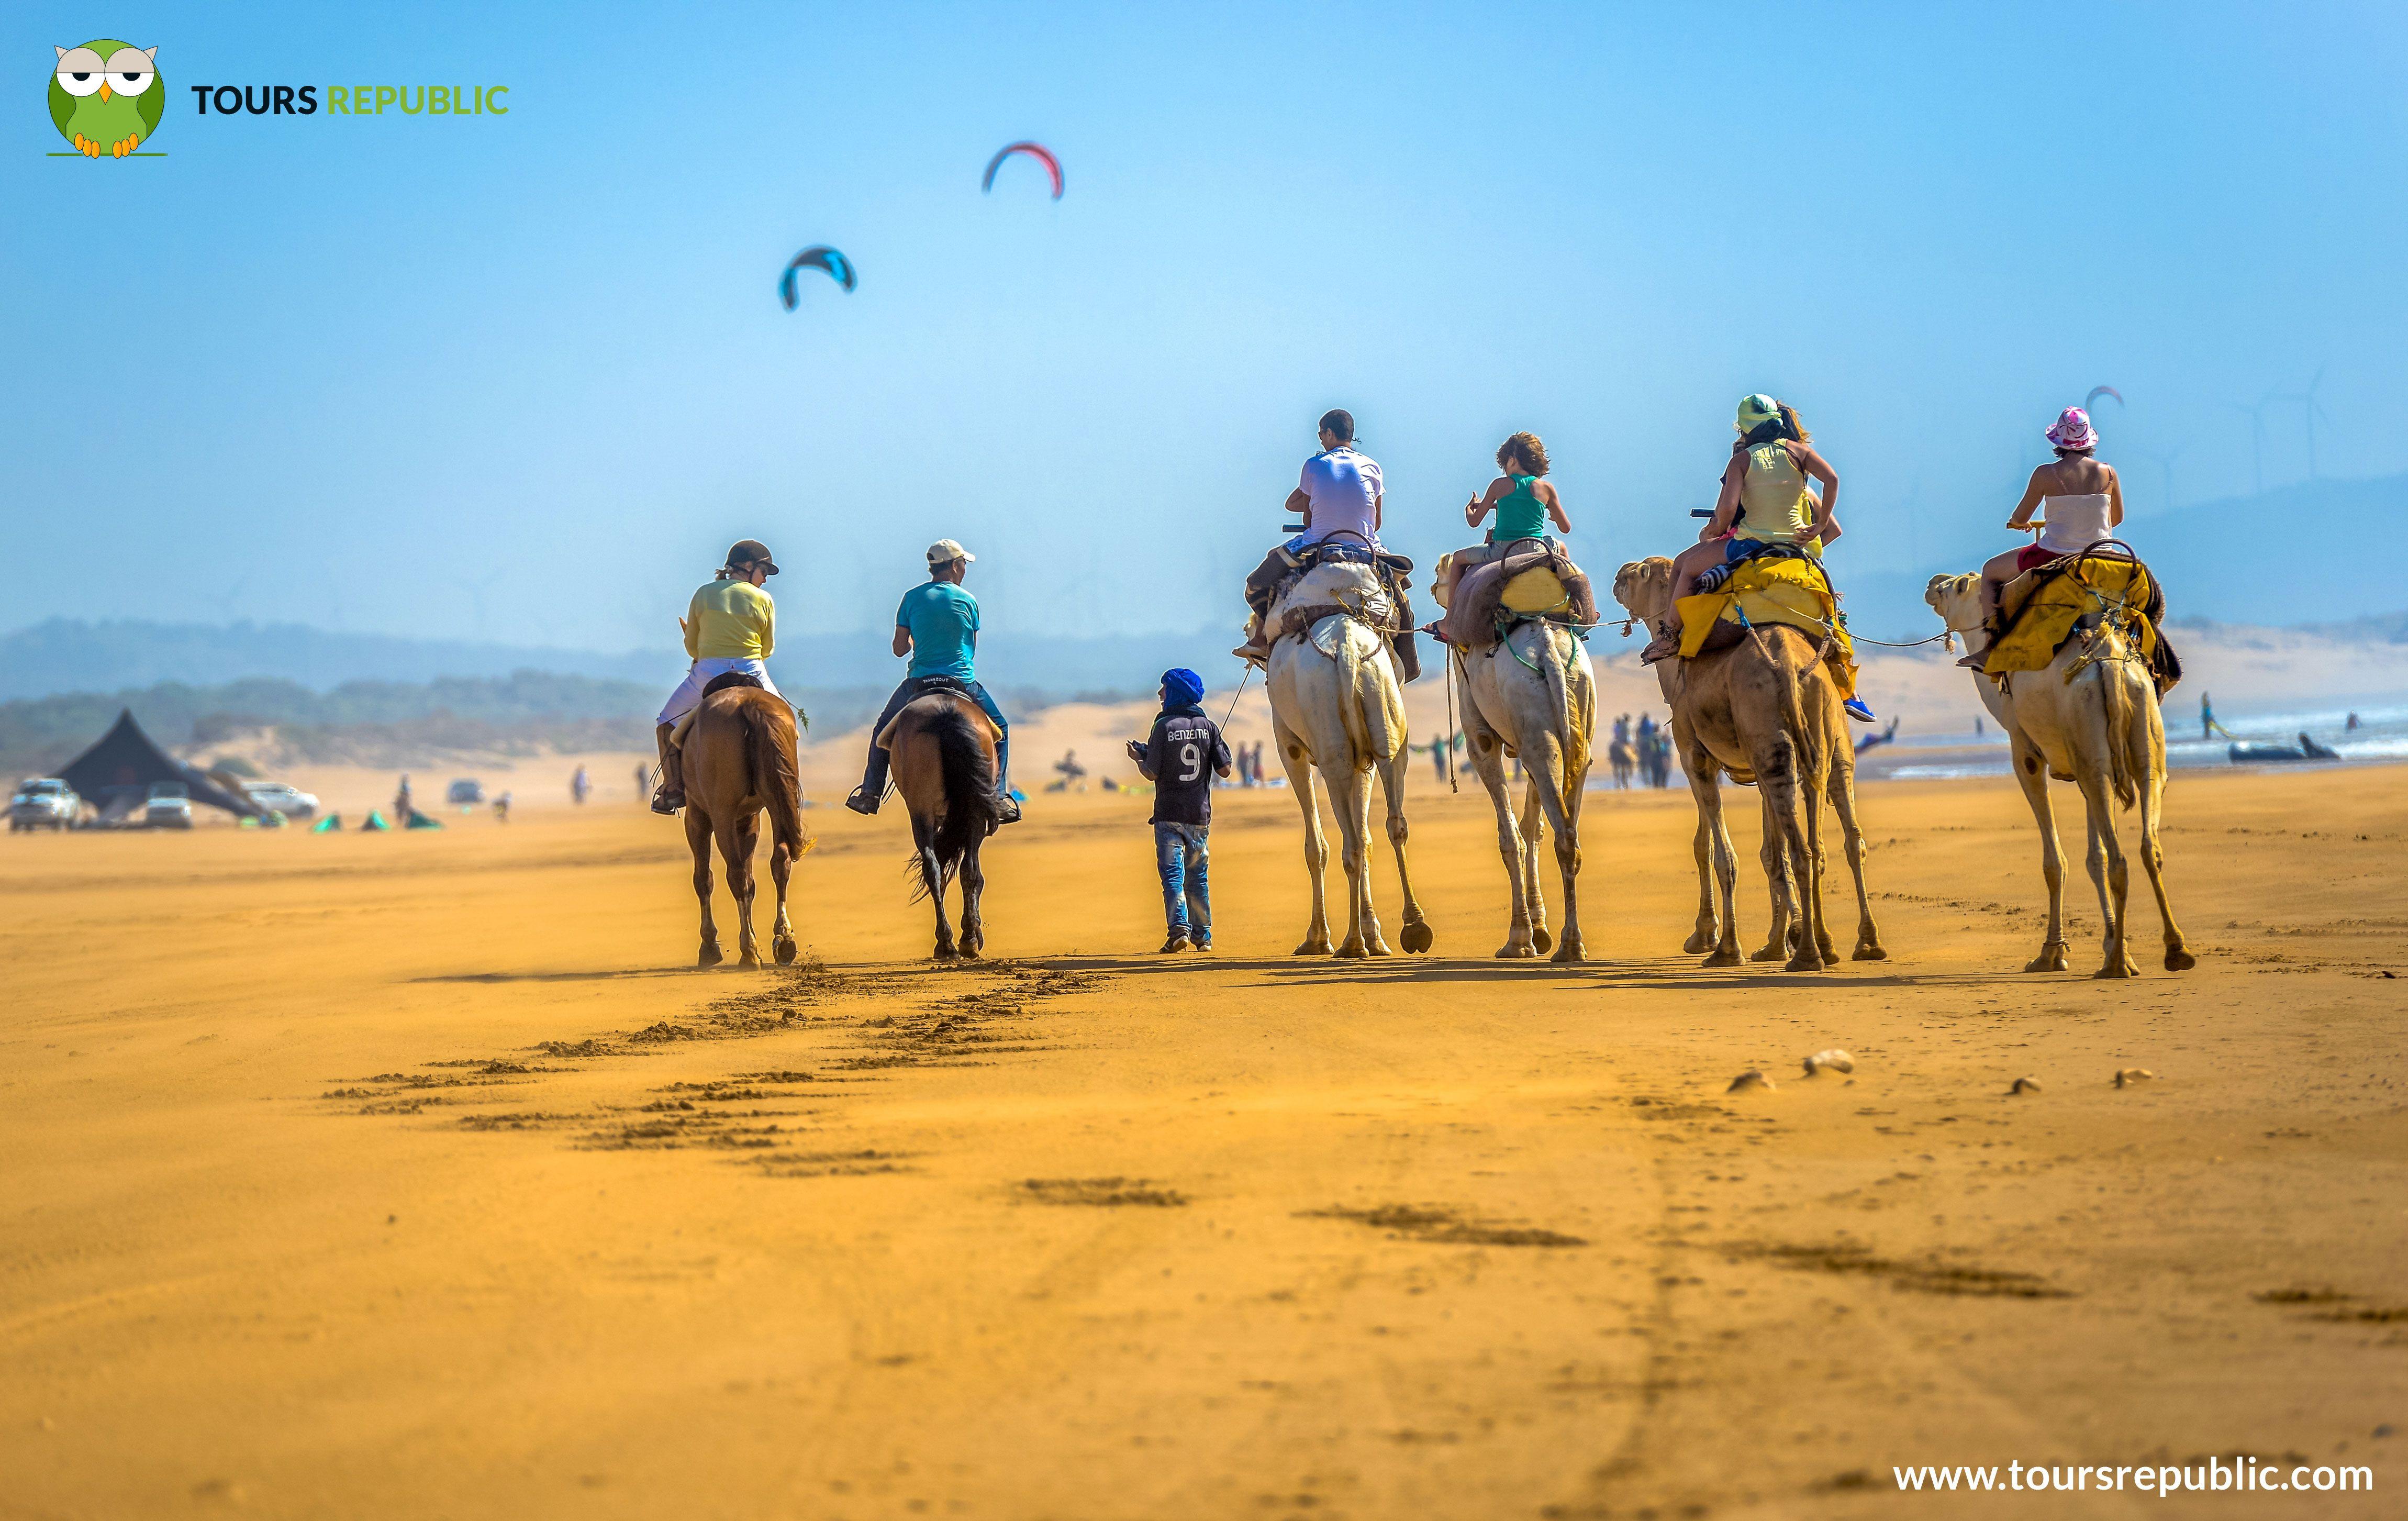 The bewildering tourist attractions in UAE figure